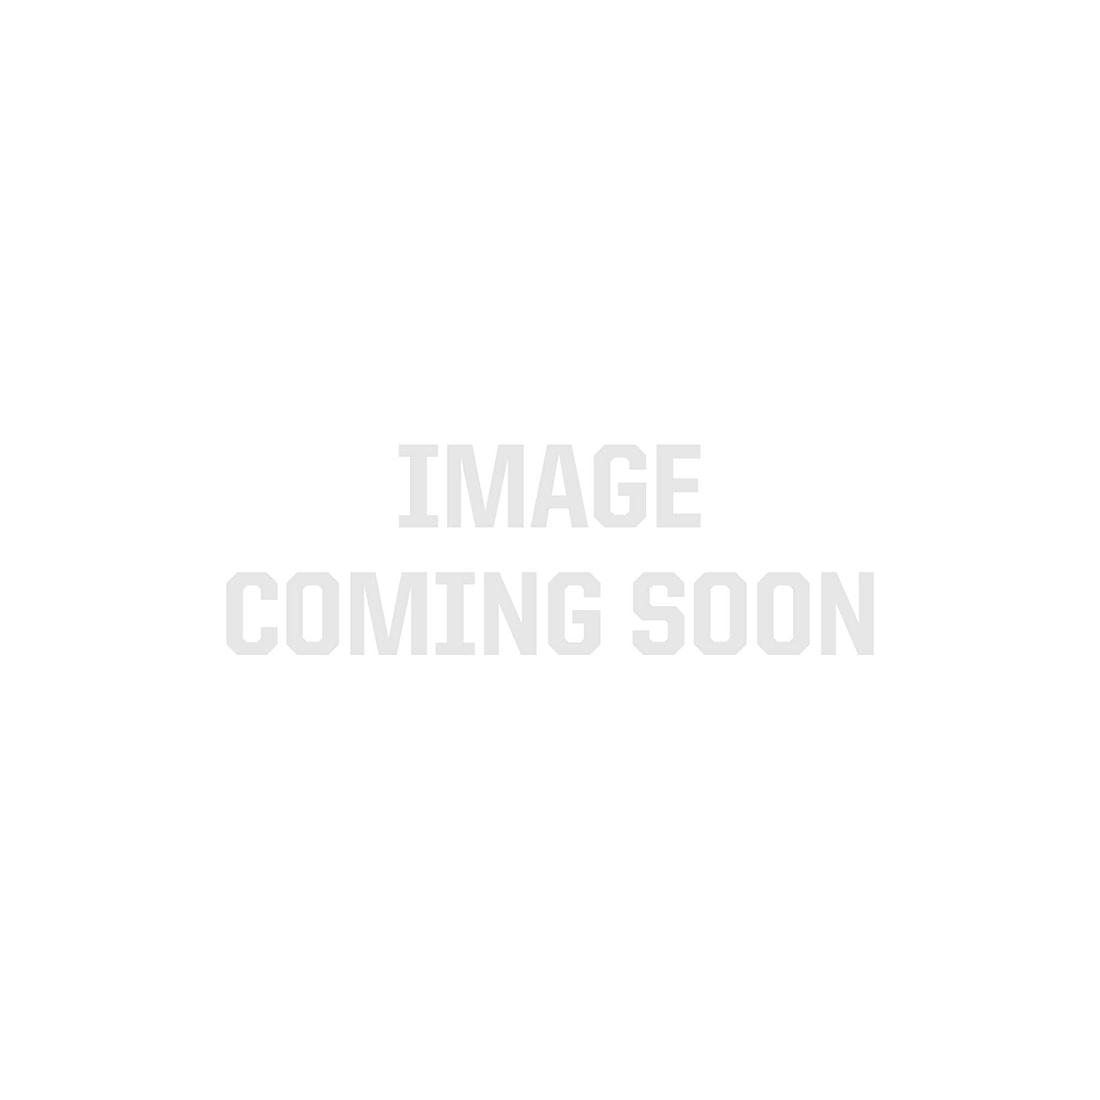 LumenMax 2835 LED Strip Light - 2,700K - 240/m - CurrentControl - 2m Reel